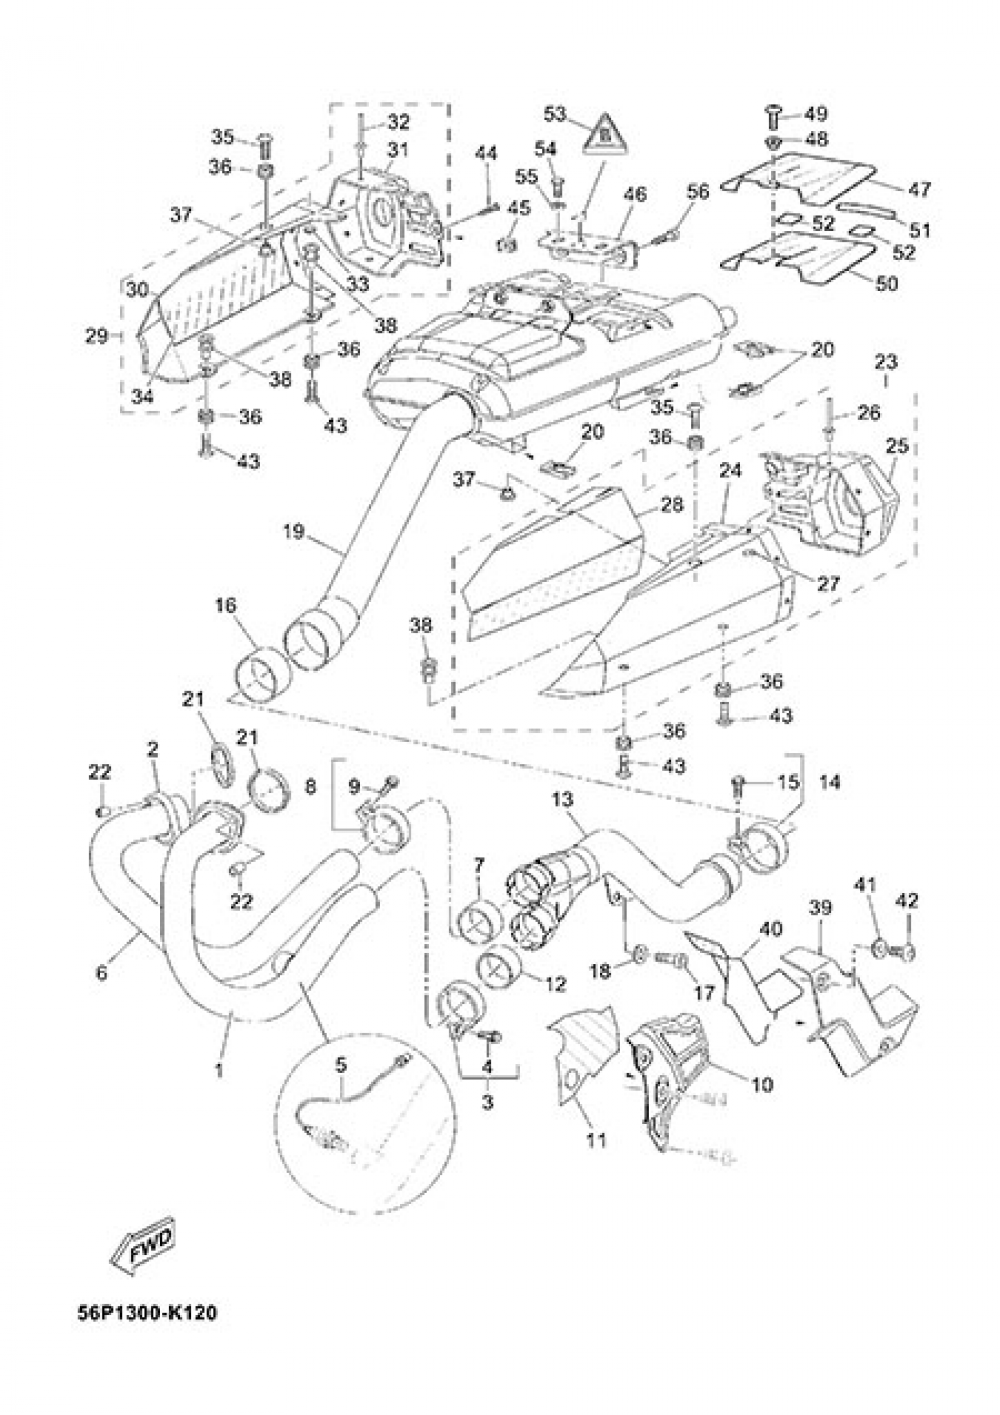 EXHAUST Yamaha XT660Z Tenere ABS 2013